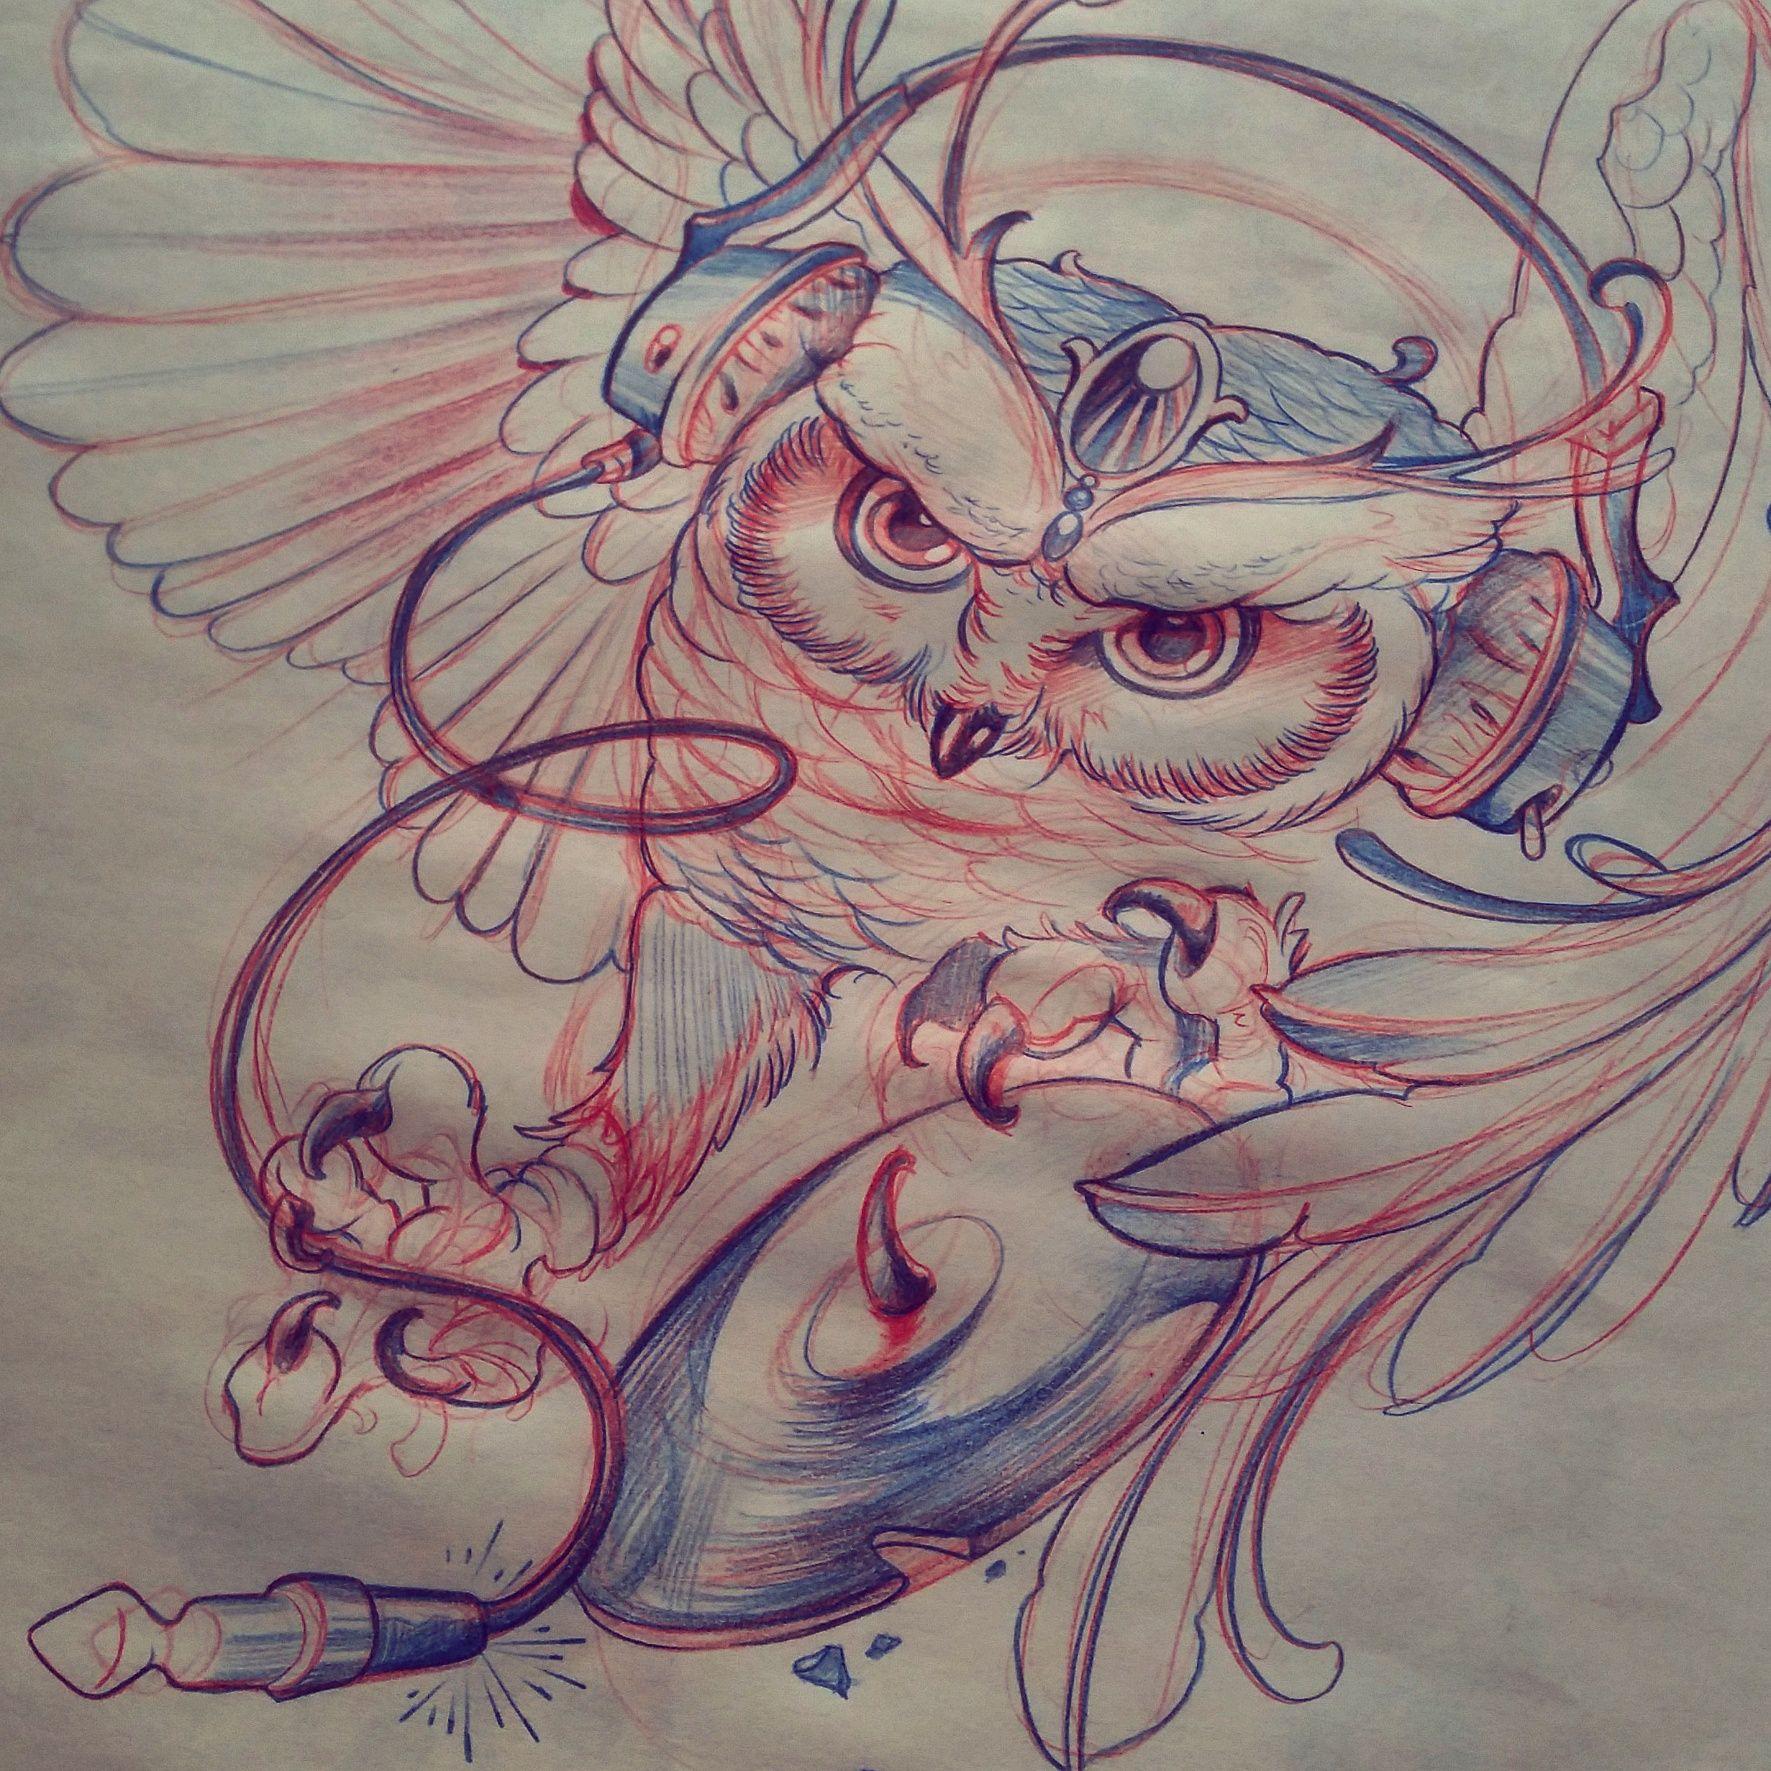 #buho #owl #plumas #dj #cascos #musica #music #dibujo #drawing #garras #claws